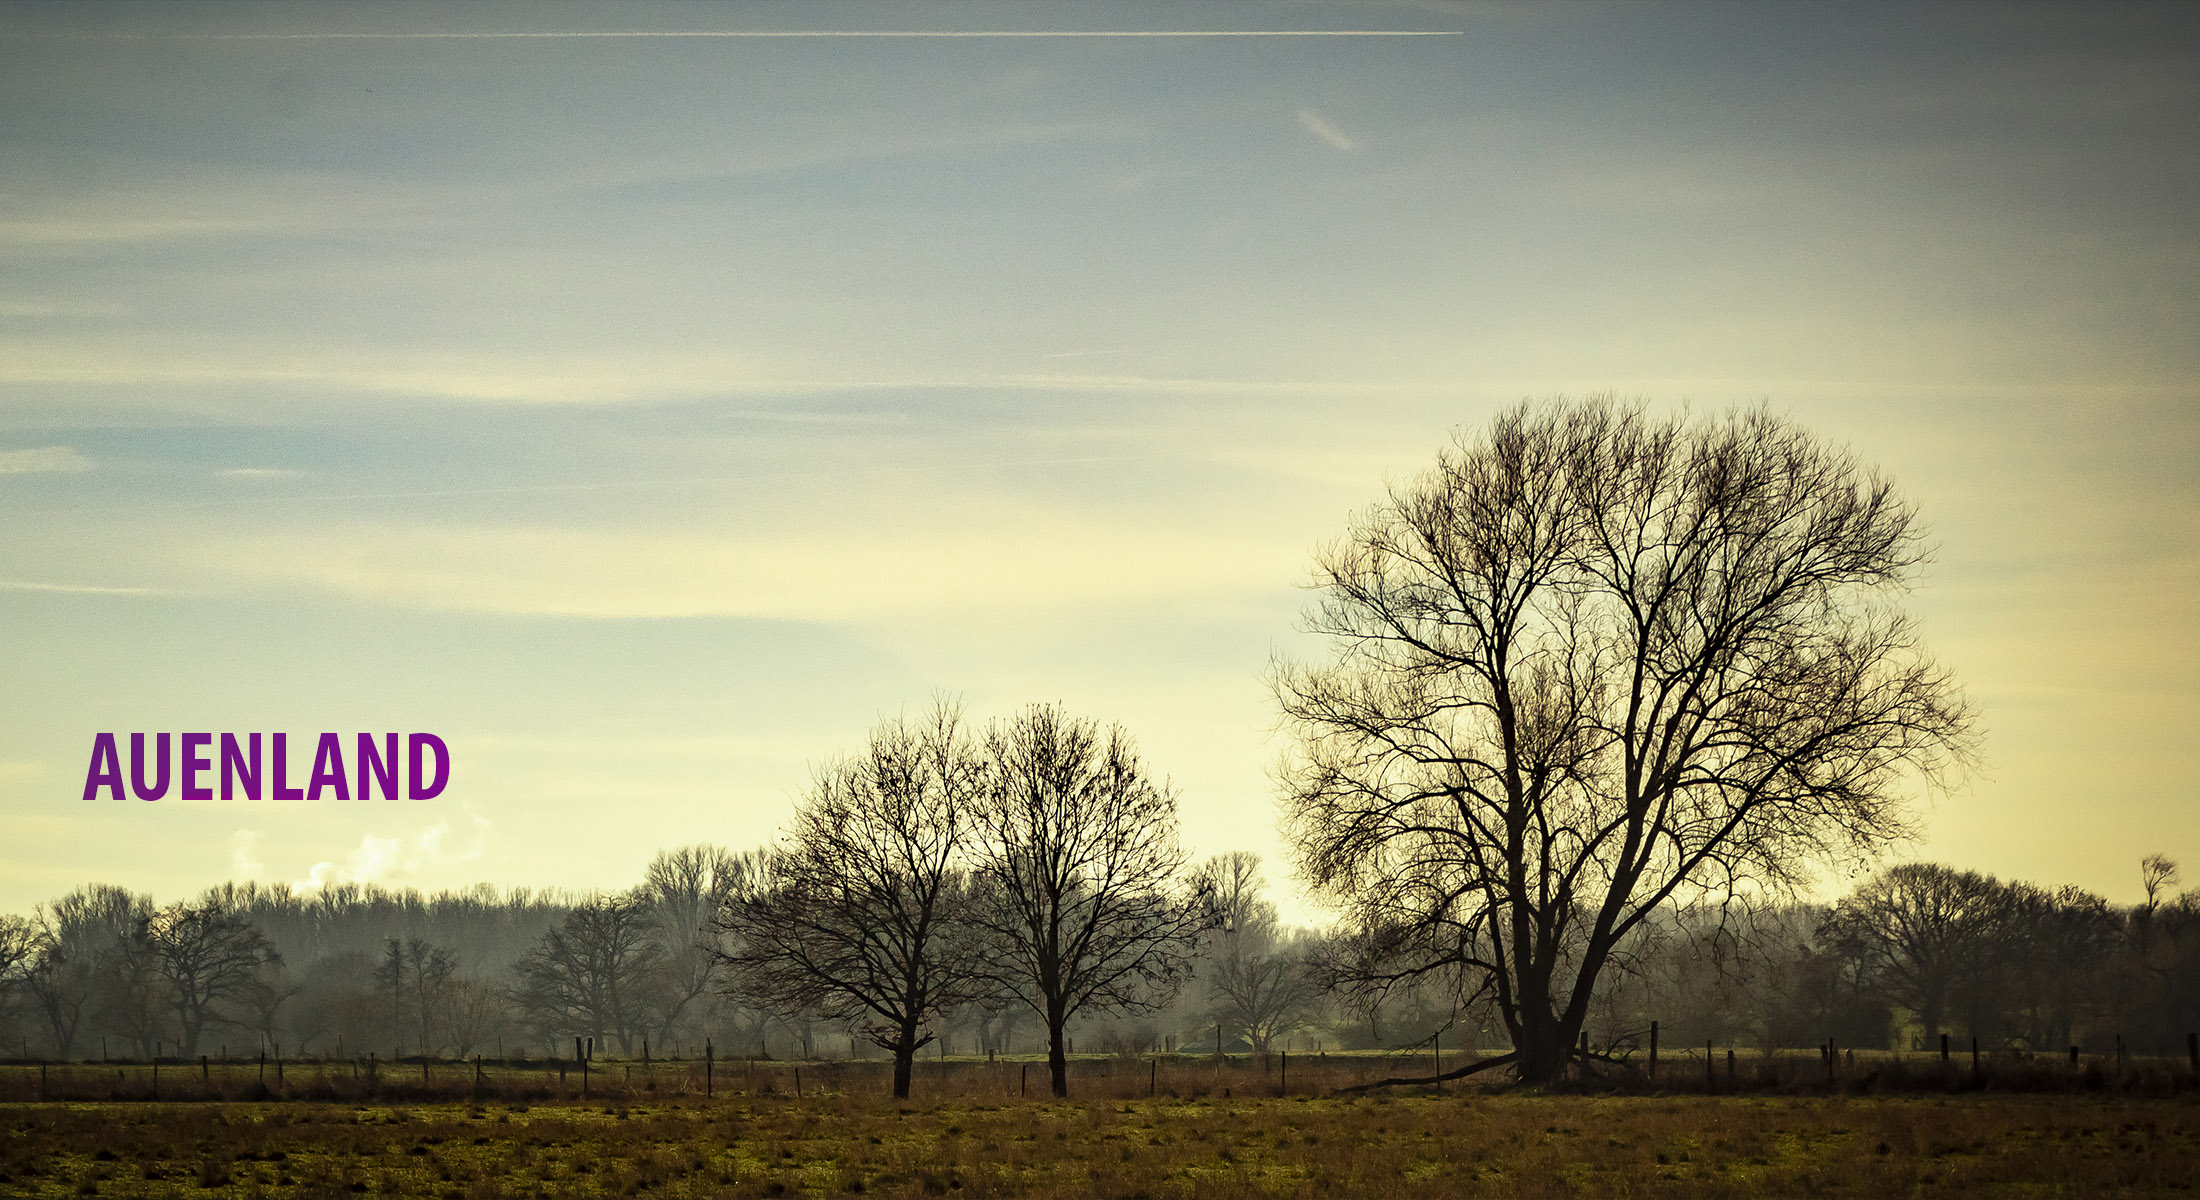 http://photography.n-code.de/wp-content/uploads/2018/12/slideauenland.jpg